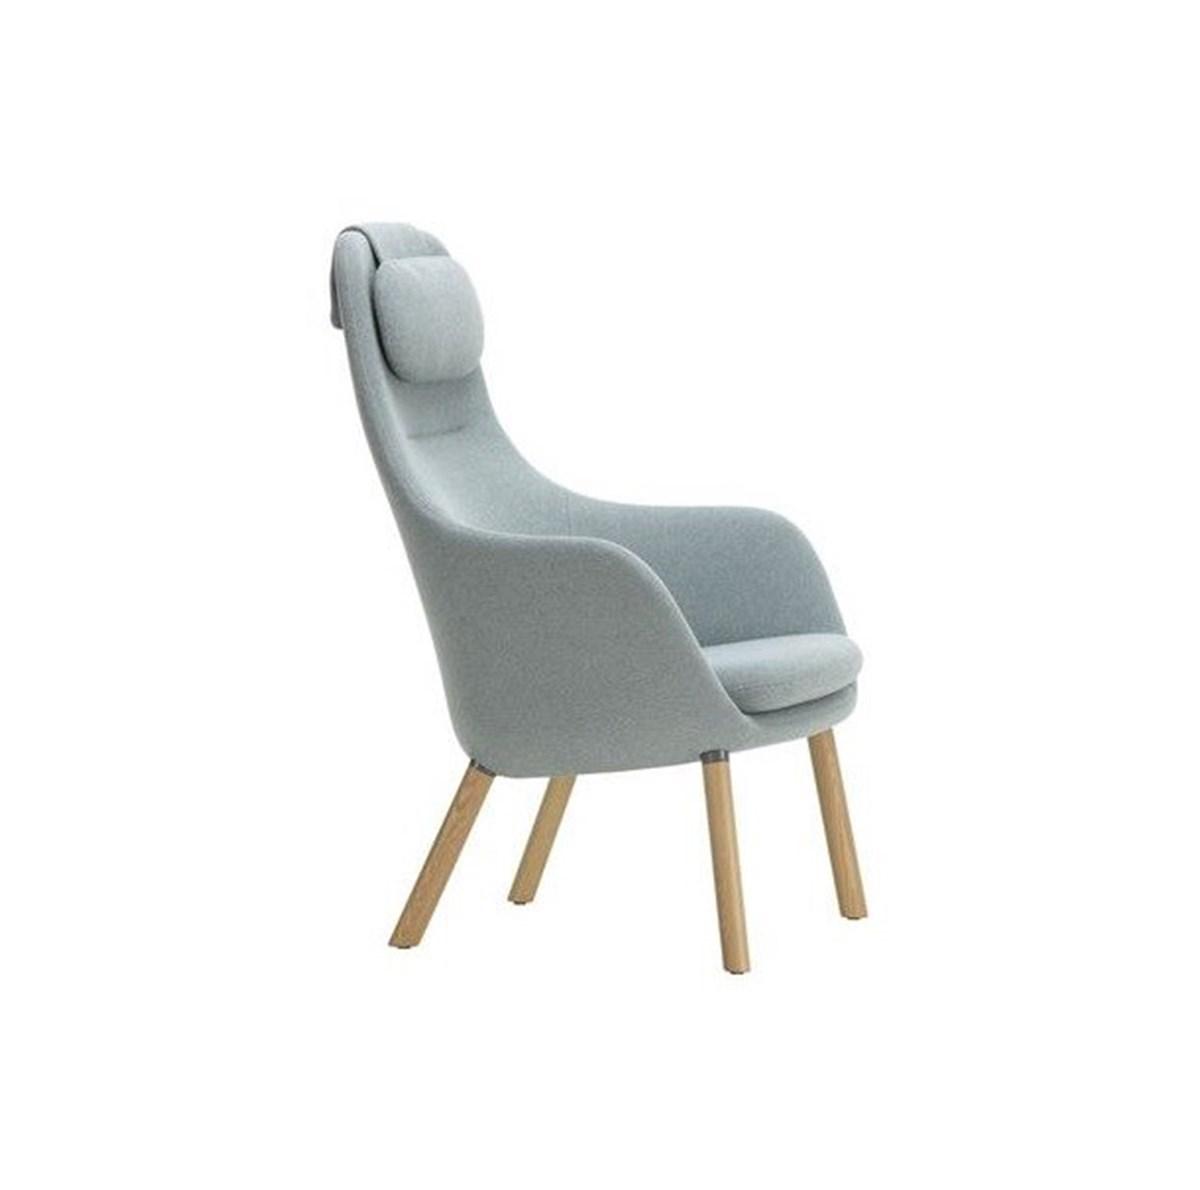 Vitra-Jasper-Morrison-HAL-Lounge-Chair-Matise-1